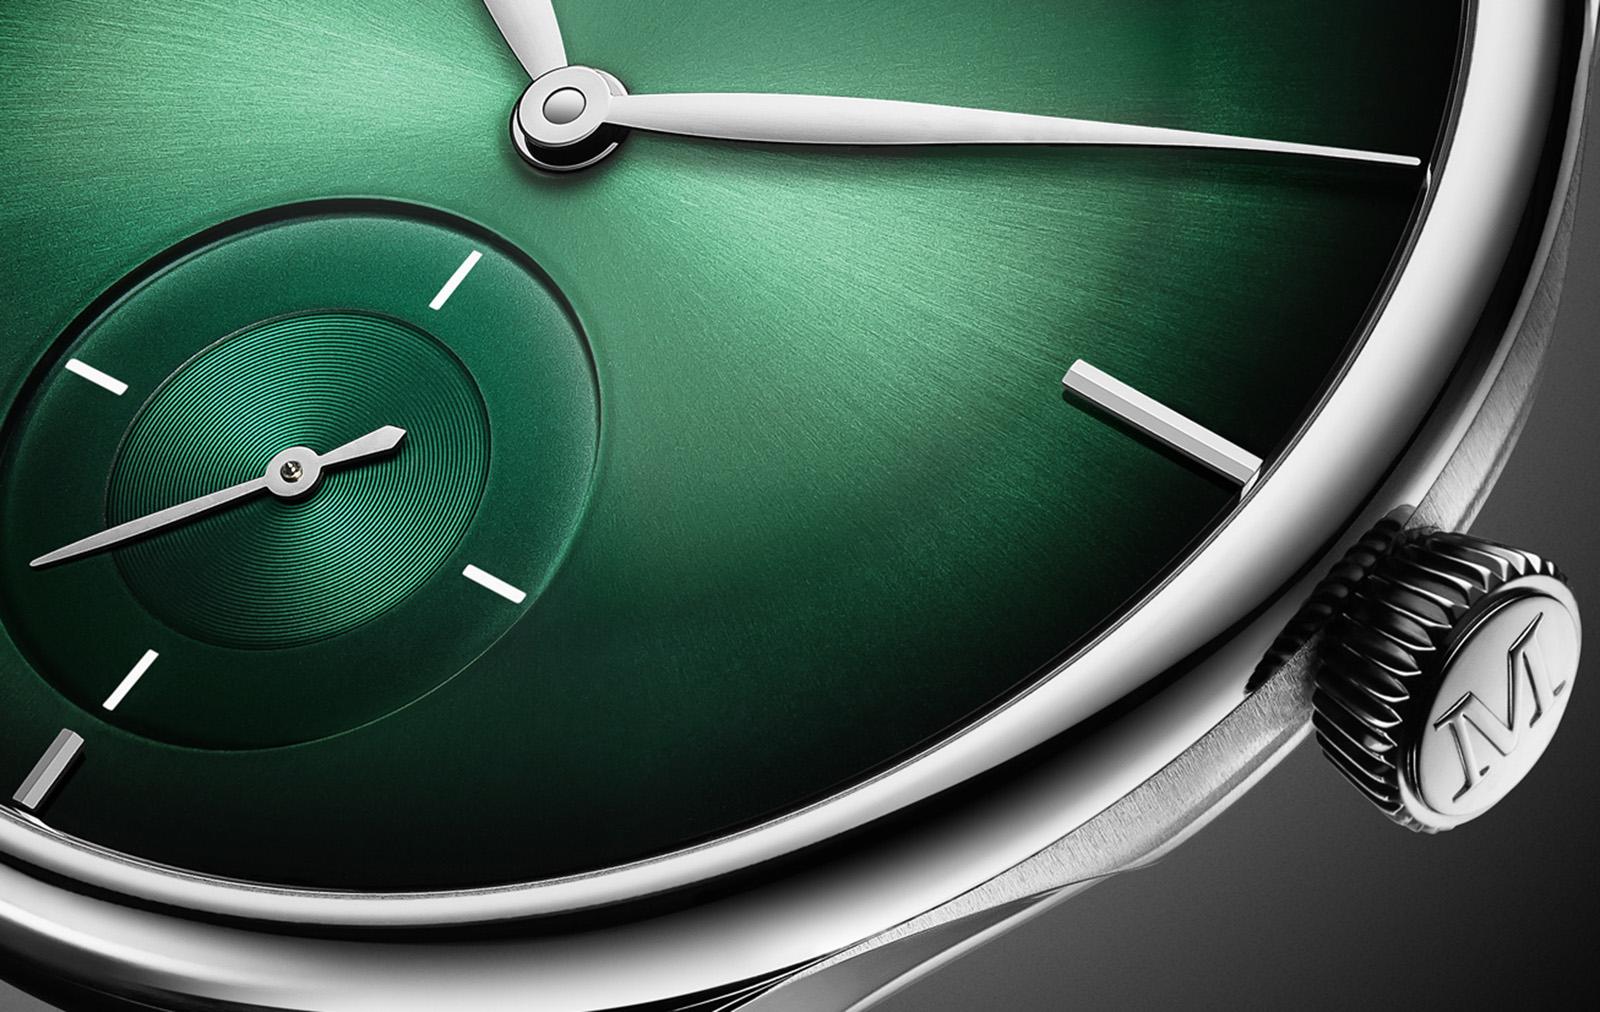 H. Moser Venturer Small Seconds XL Purity Cosmic Green - 1